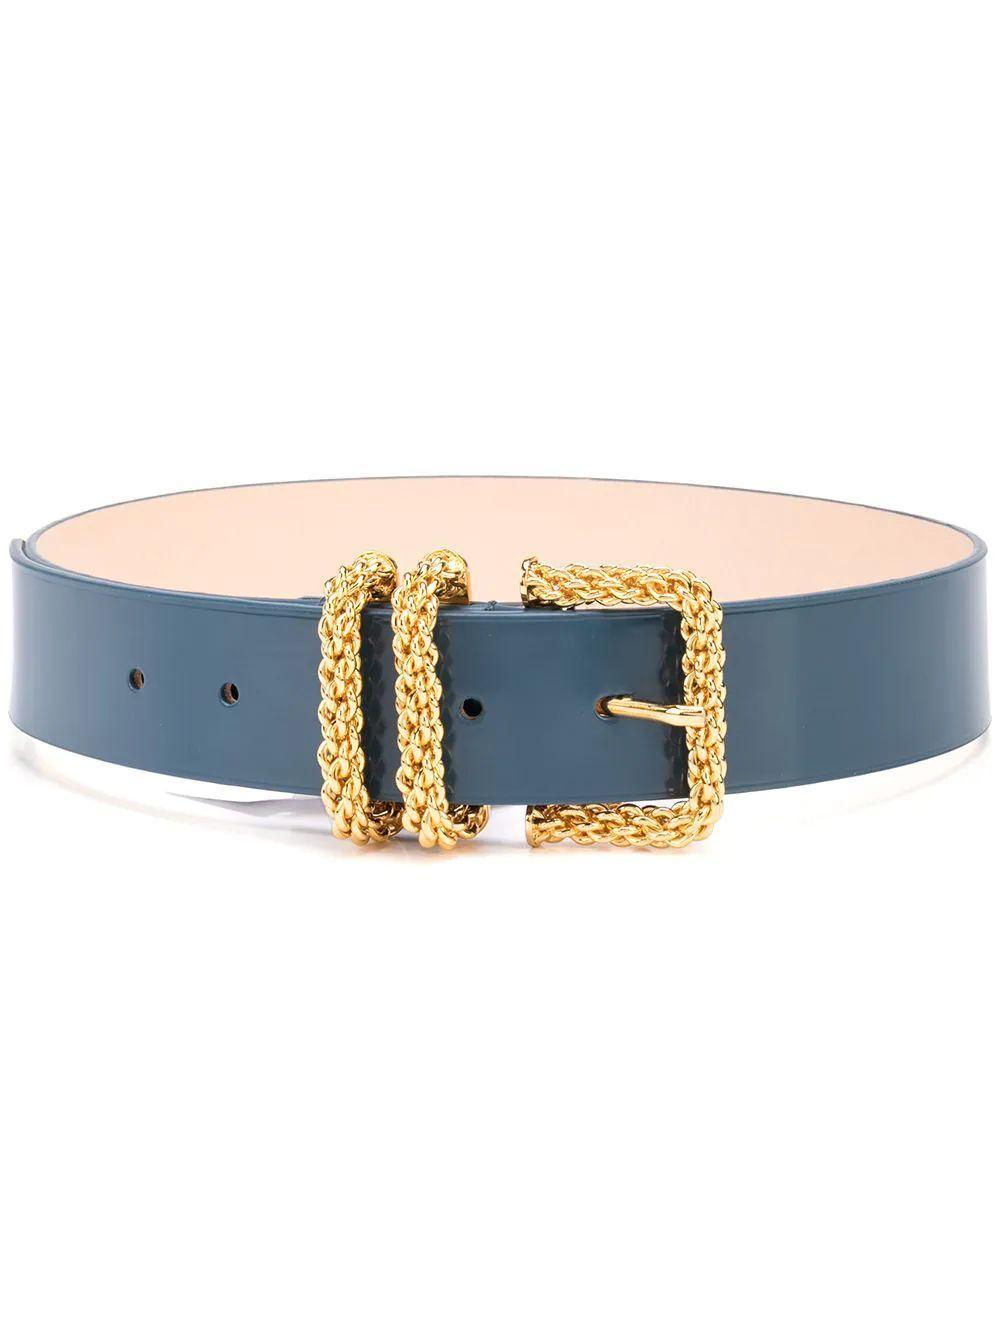 Katina Semi- Patent Leather Belt Item # 21PFKTNWCBLW